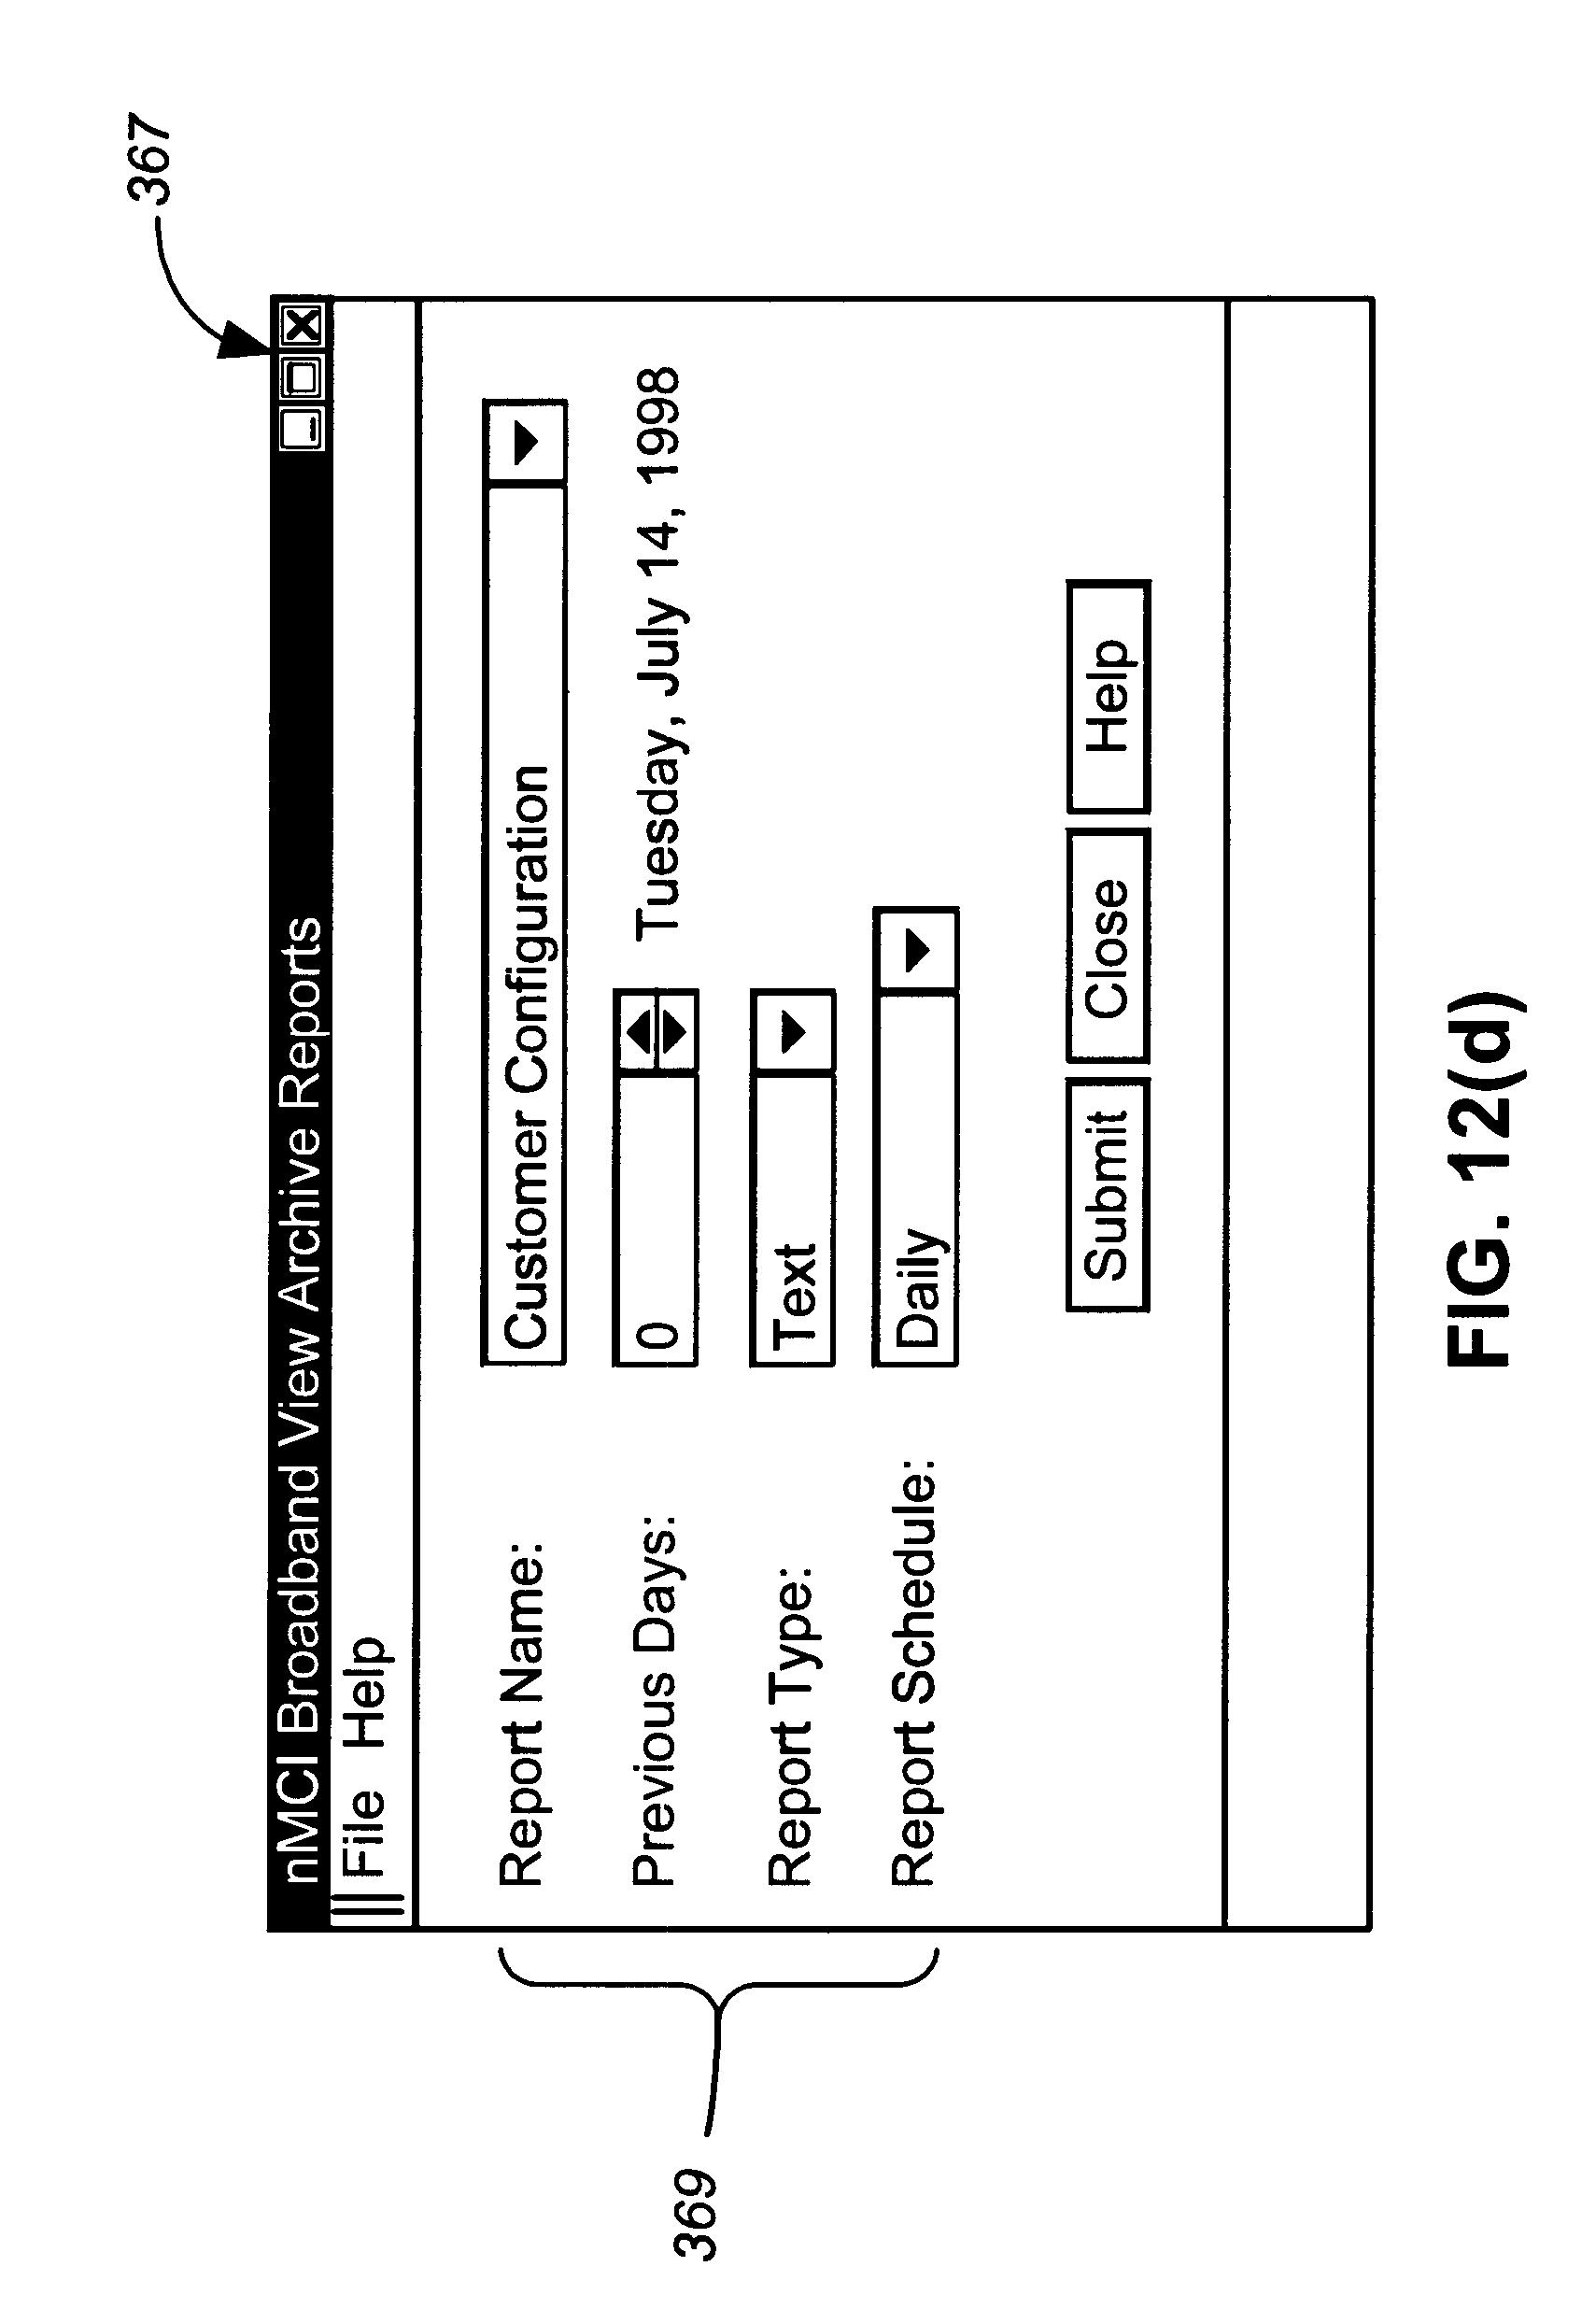 US B1 Integrated proxy interface for web based broadband